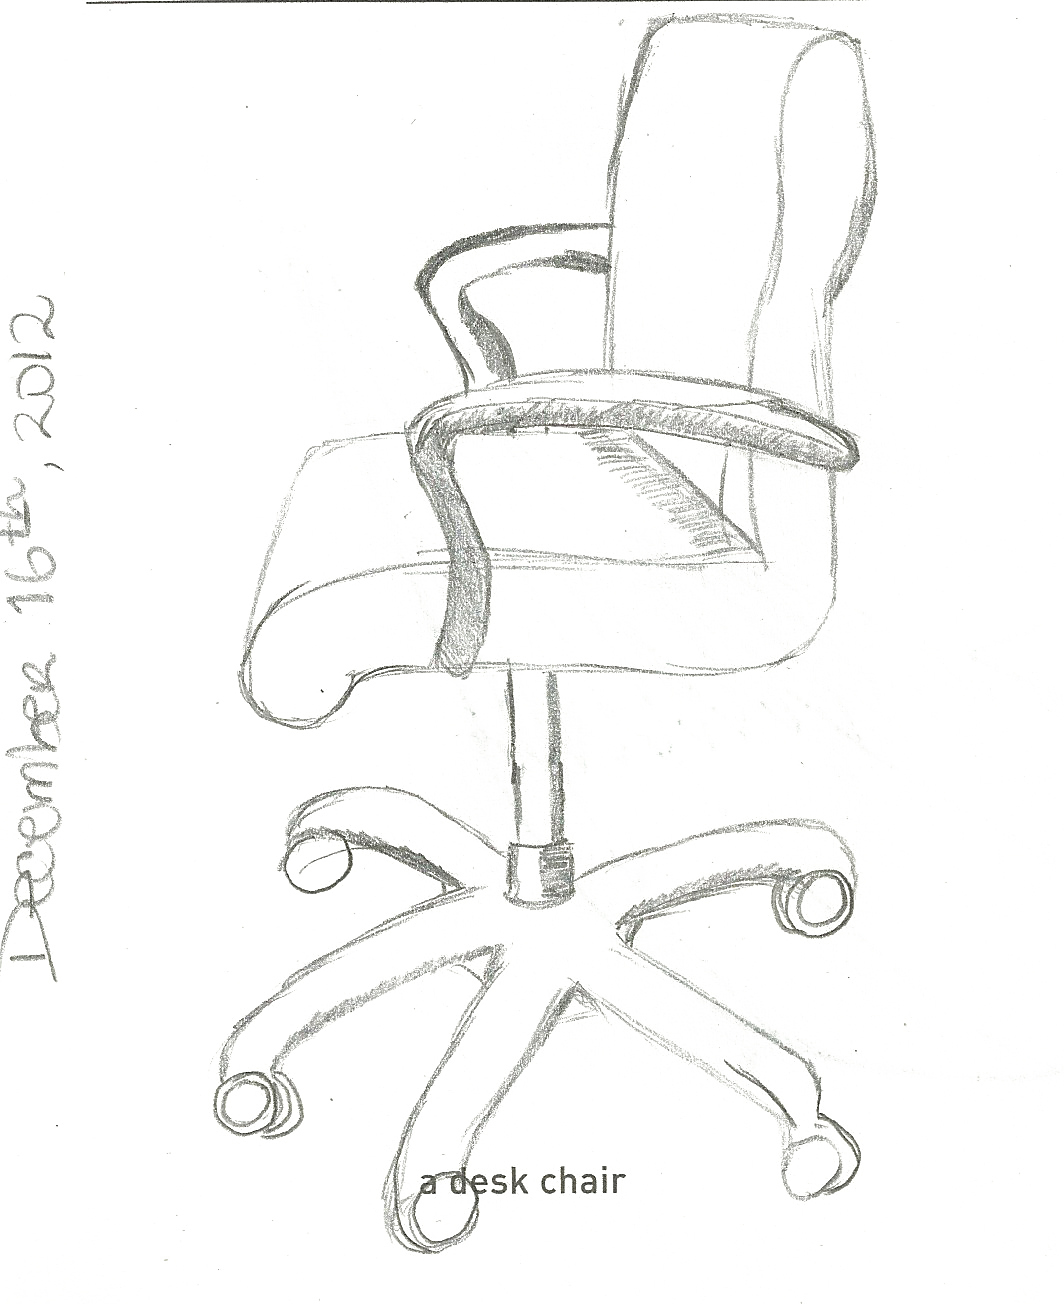 005 A Desk Chair Doodle Company